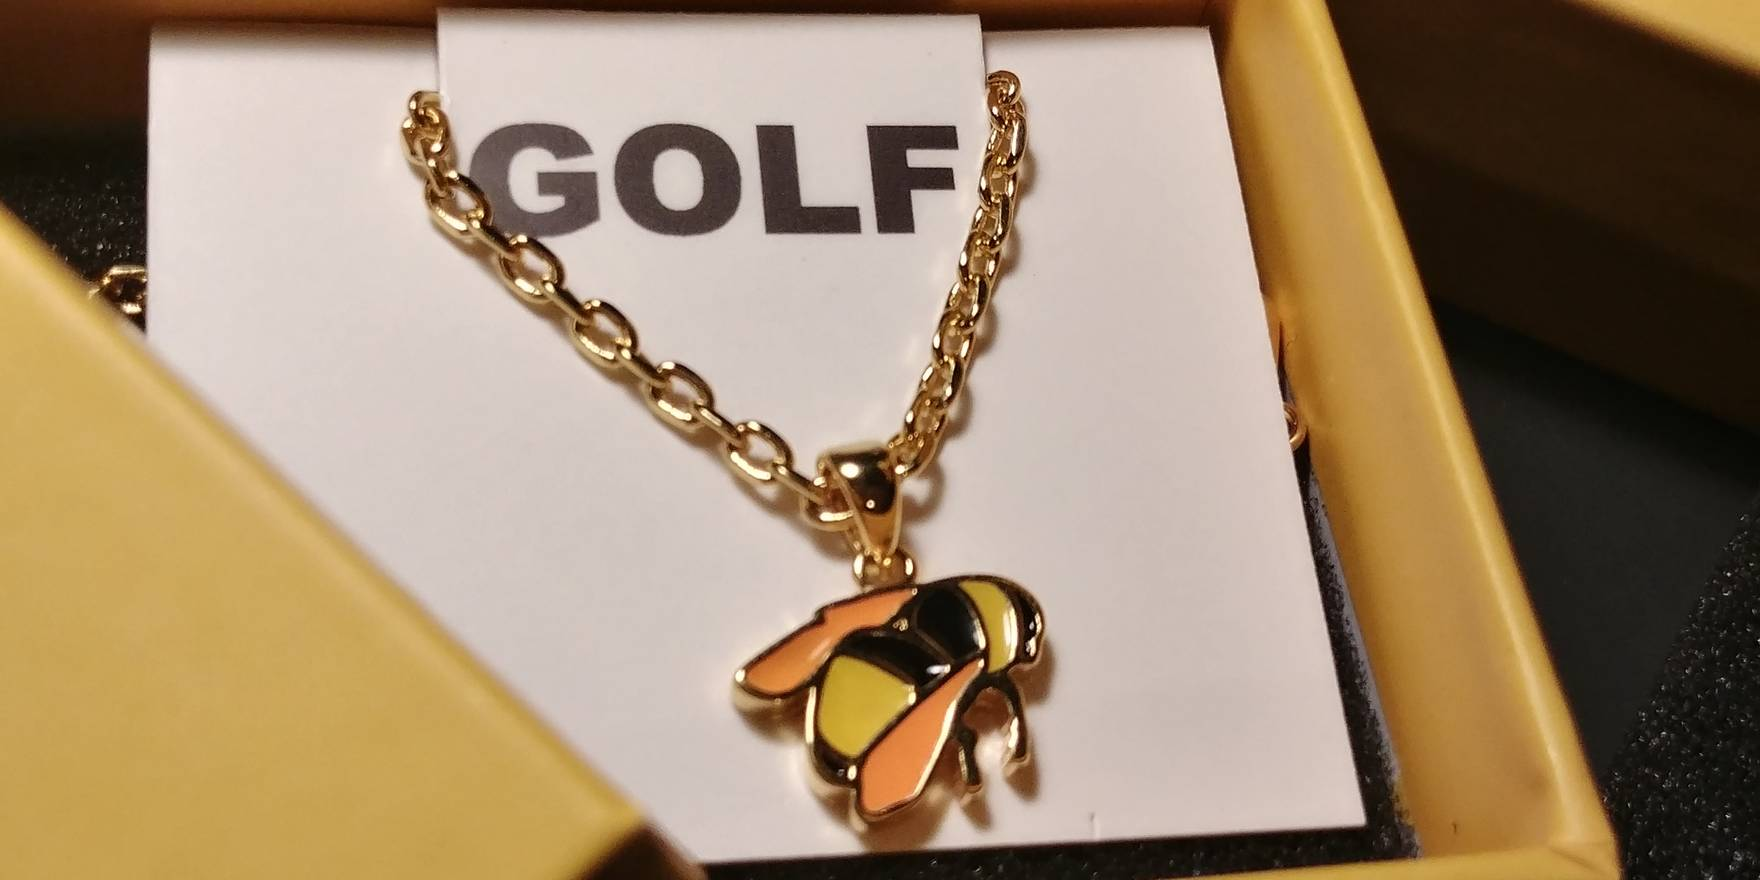 Golf wang flower boy bee necklace golf wang tyler the creator golf wang flower boy bee necklace golf wang tyler the creator size one aloadofball Images